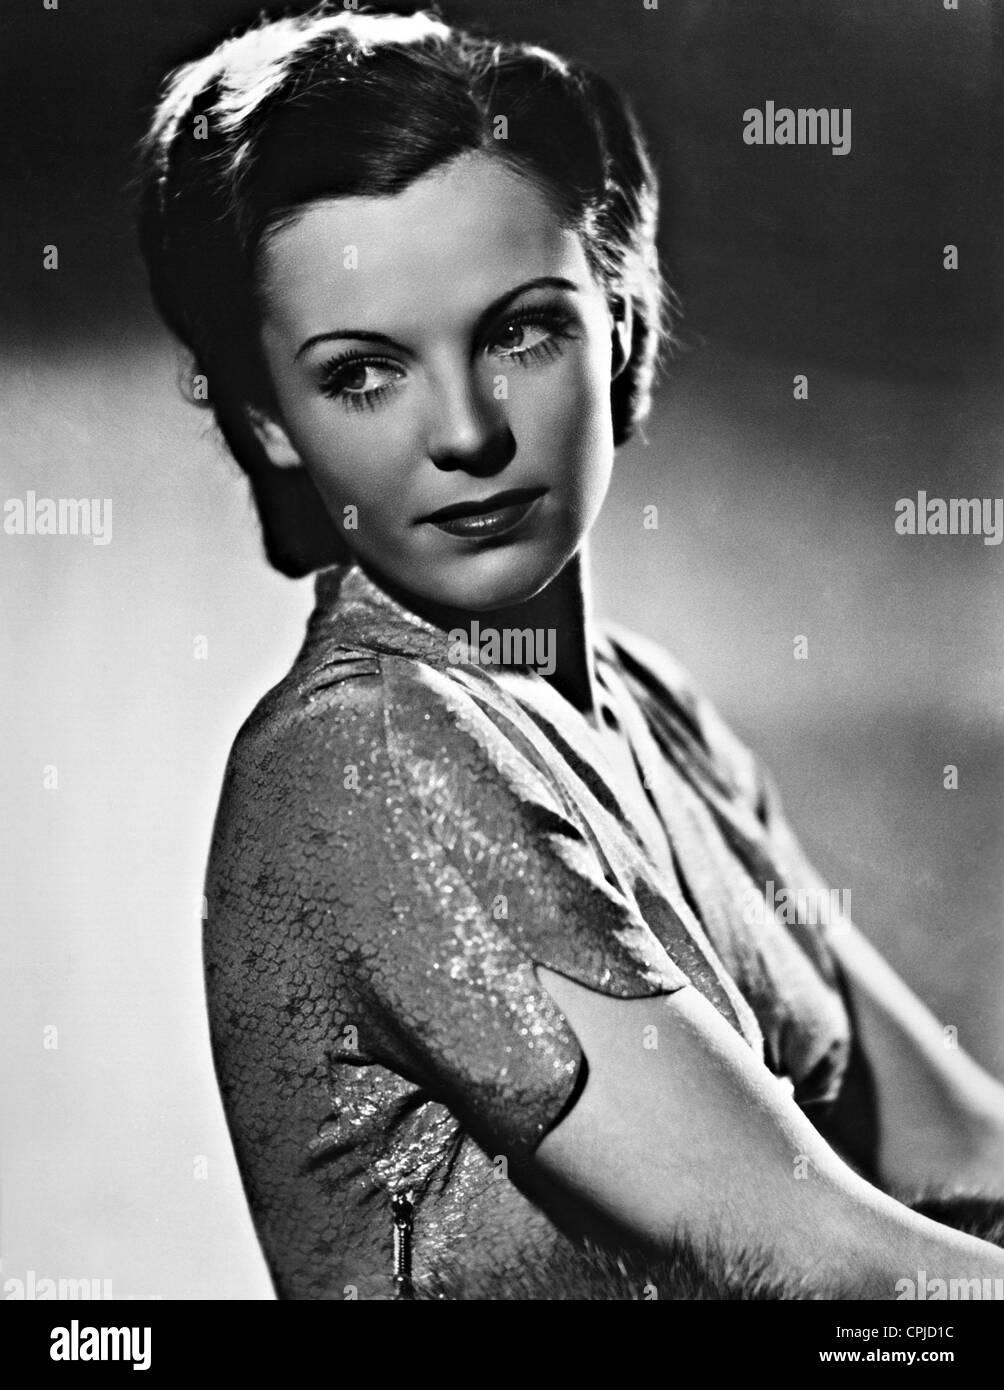 Hilde Krahl in 'Gastspiel im Paradies', 1938 - Stock Image